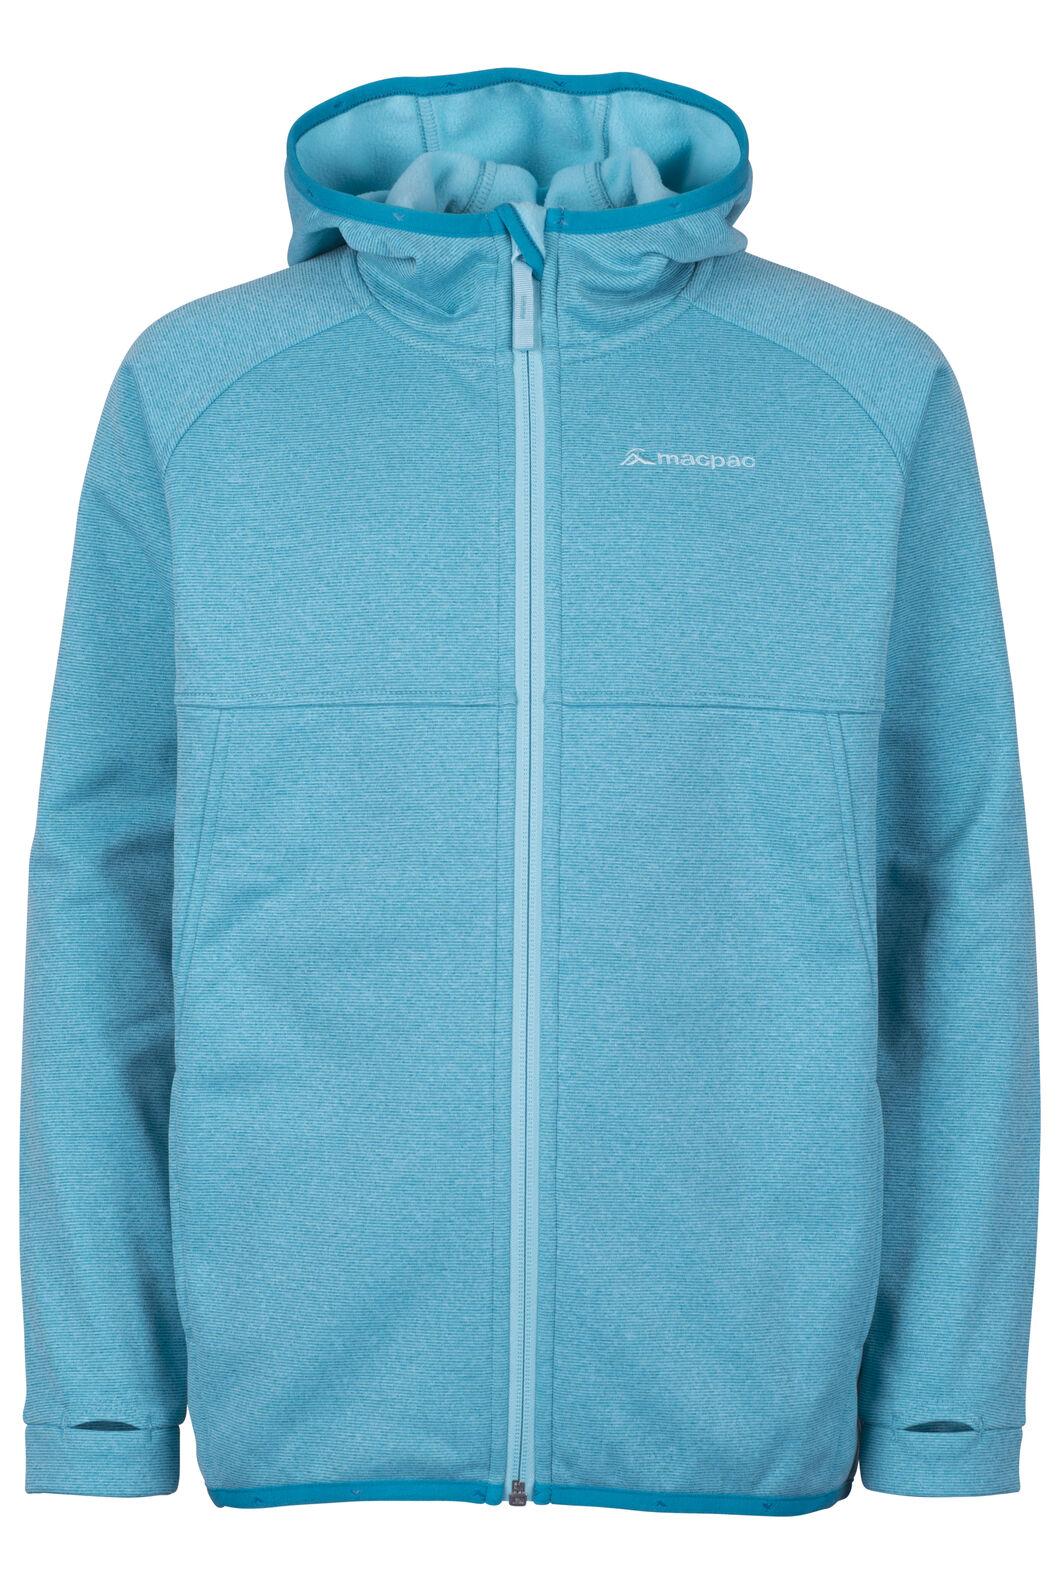 Macpac Kiwi Fleece Jacket - Kids', Enamel Blue, hi-res